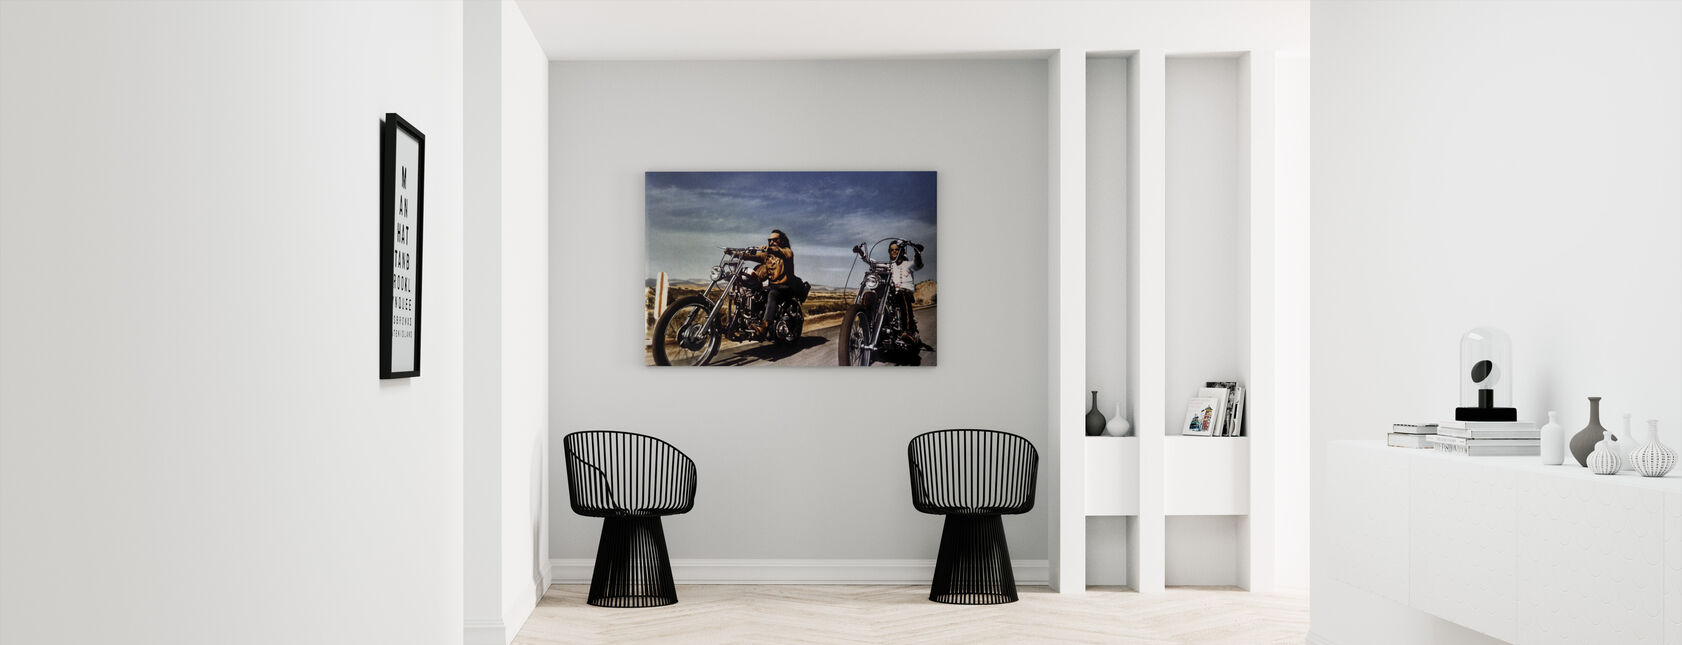 Dennis Hopper and Peter Fonda in Easy Rider - Canvas print - Hallway